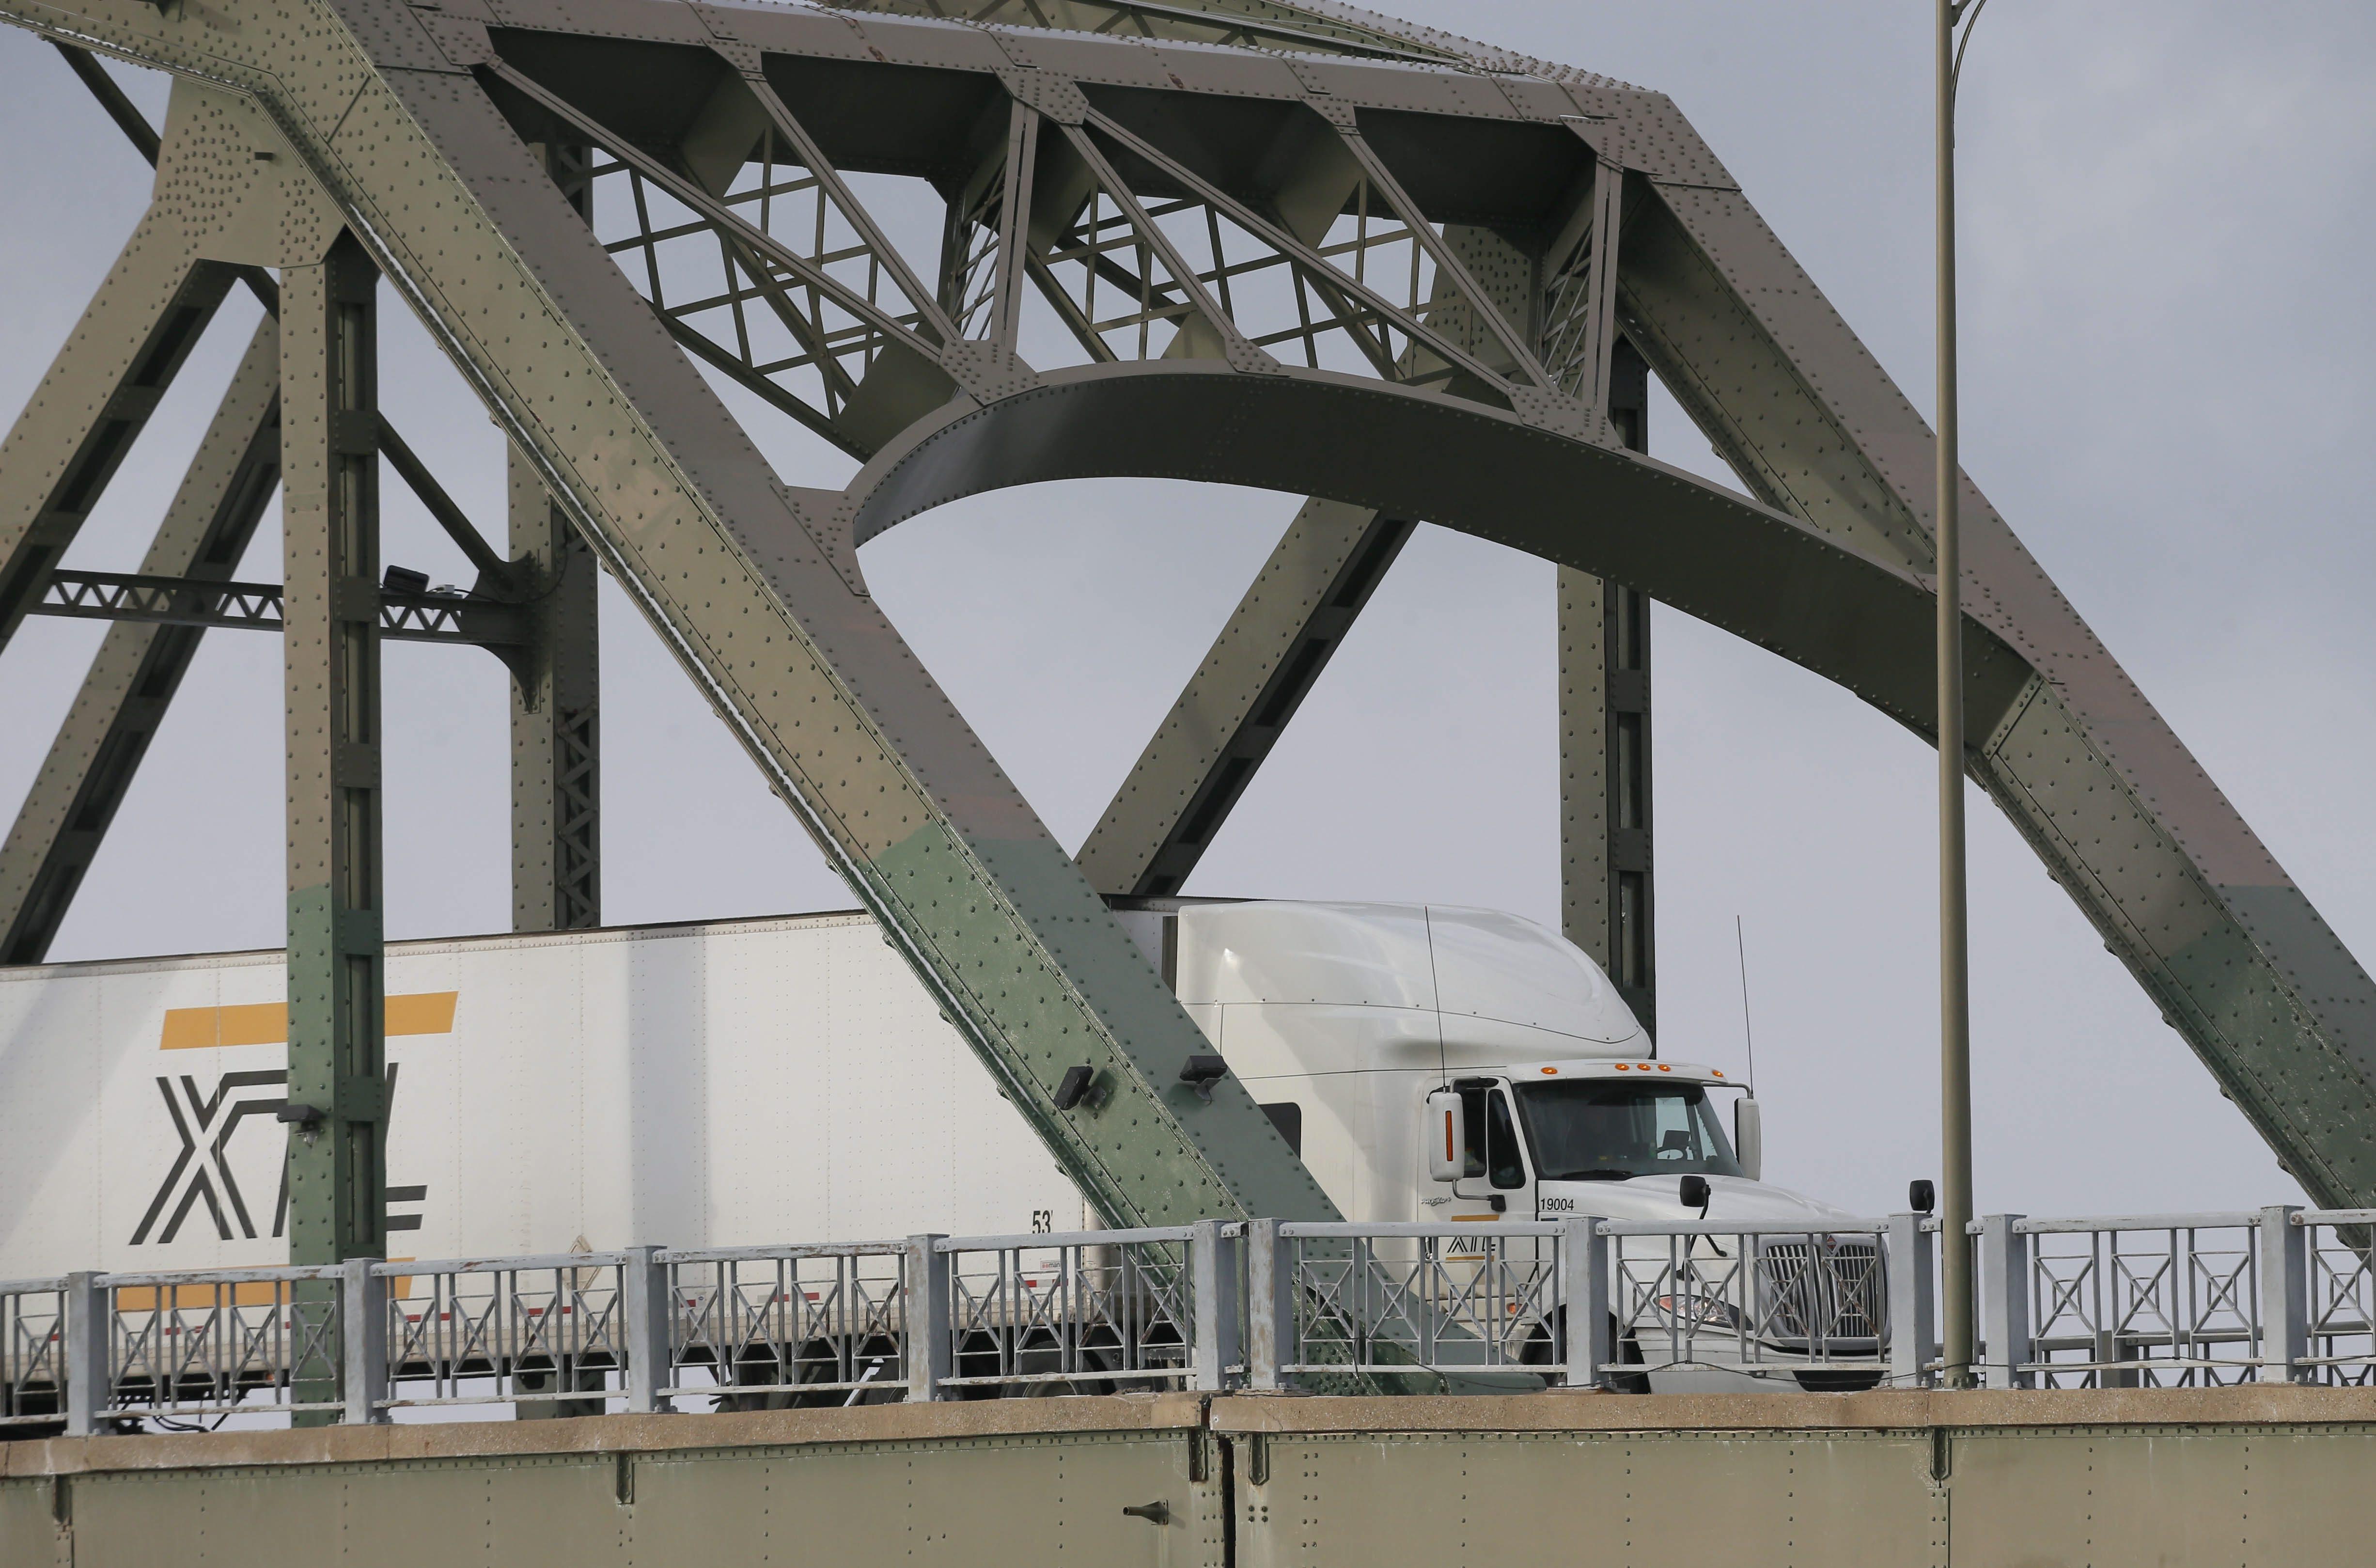 Inspections of U.S.-bound cargo on Canadian side of Peace Bridge could begin Feb. 24. (Derek Gee/Buffalo News)